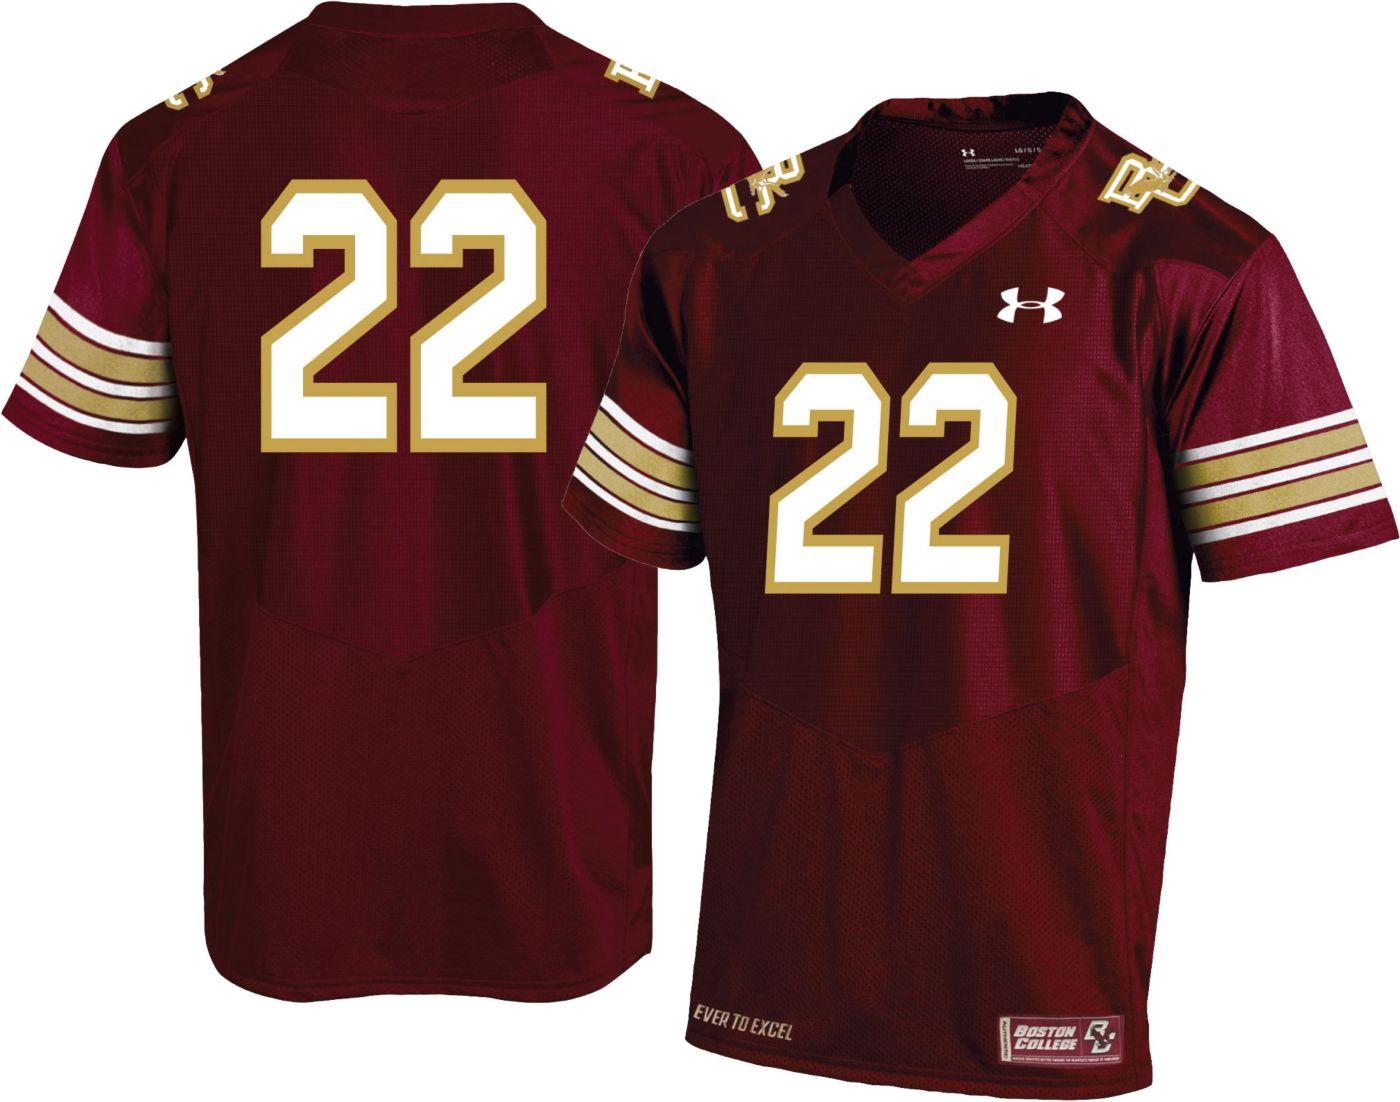 Under Armour Men's Boston College Eagles #22 Maroon Replica Football Jersey